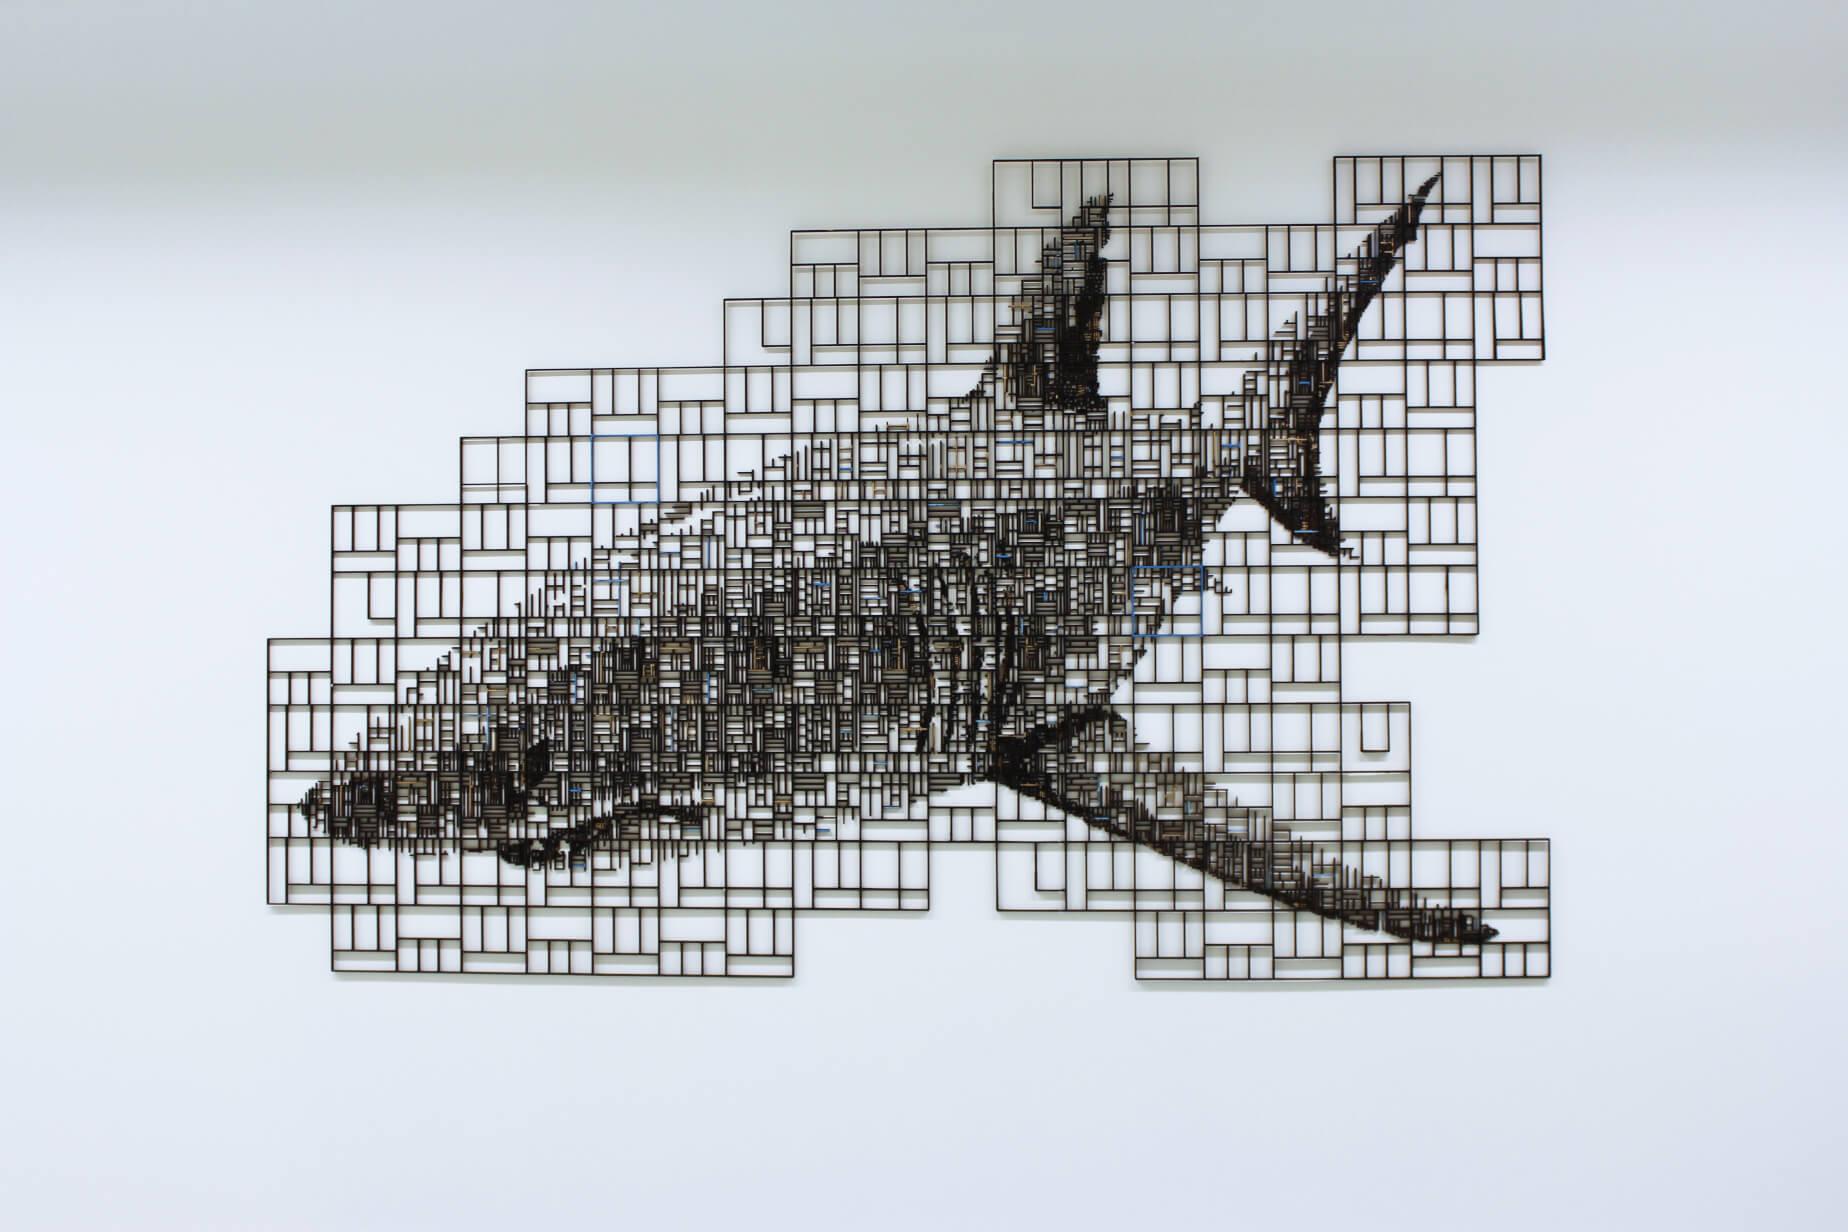 SHARK_OFFTHEGRID ___BY___ EMCAYS